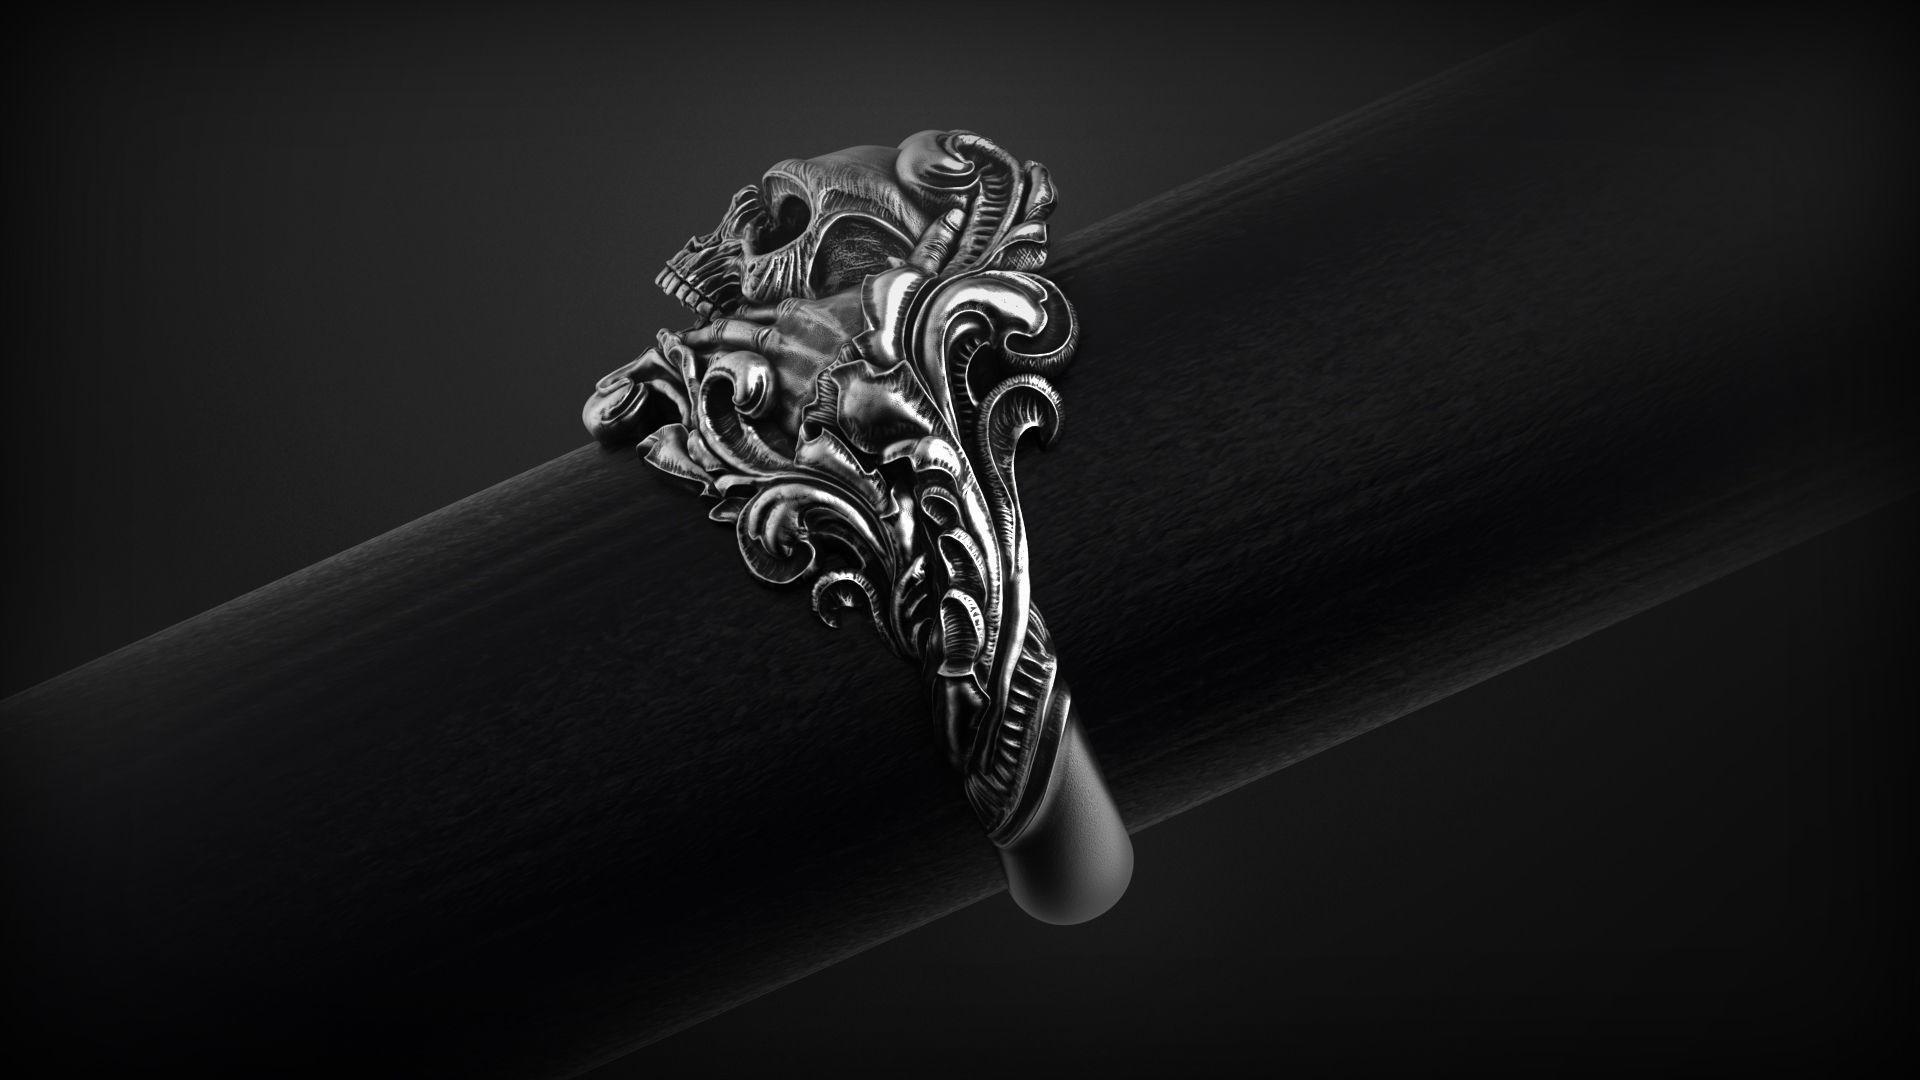 vintage-skull-ring-3d-model-for-3d-printing-3d-model-obj-stl (2).jpg Download OBJ file Vintage Ring • 3D print template, Roman_Kharikov